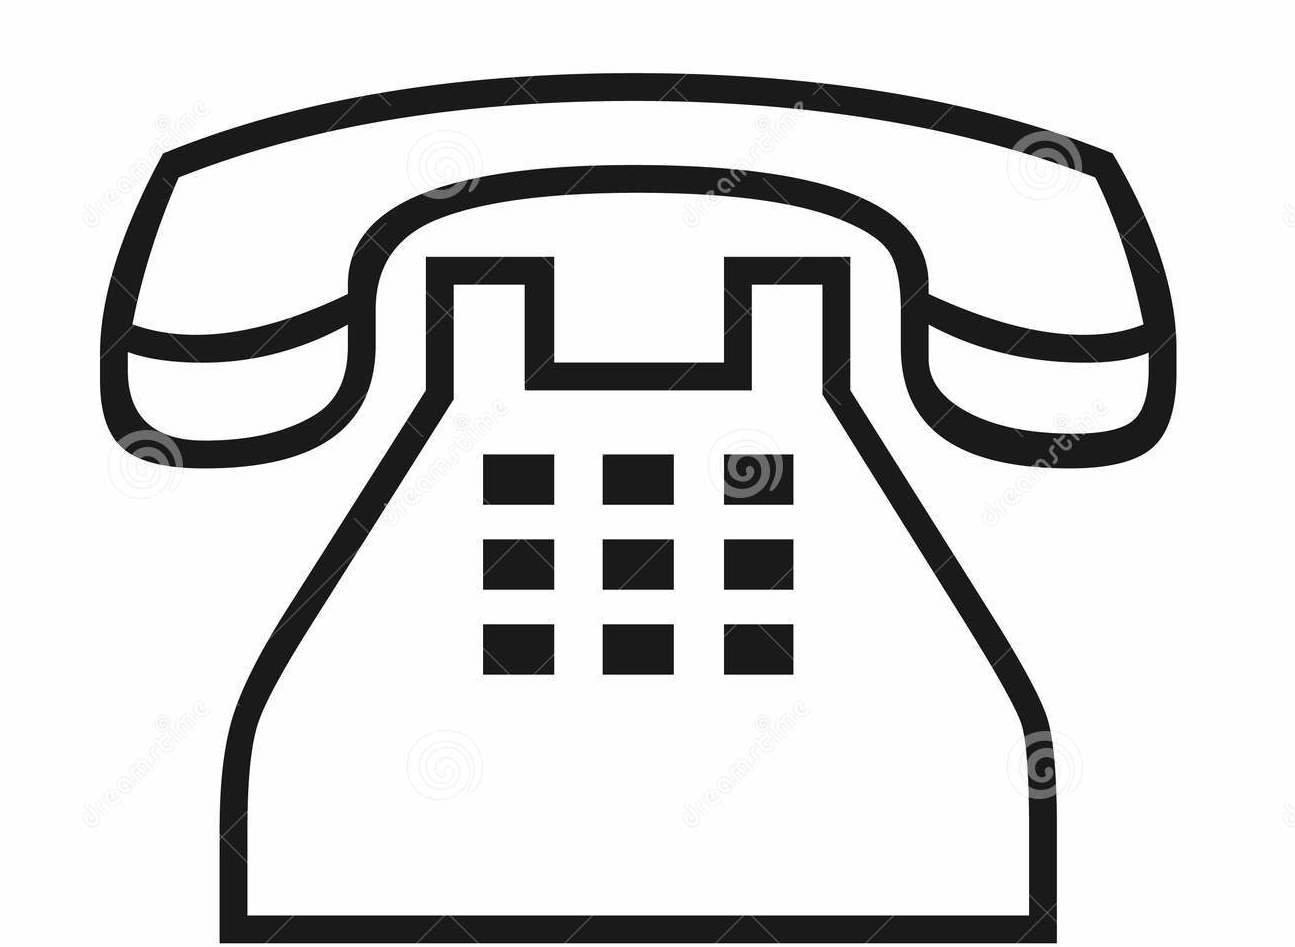 rsz_1phone-symbol-7859301